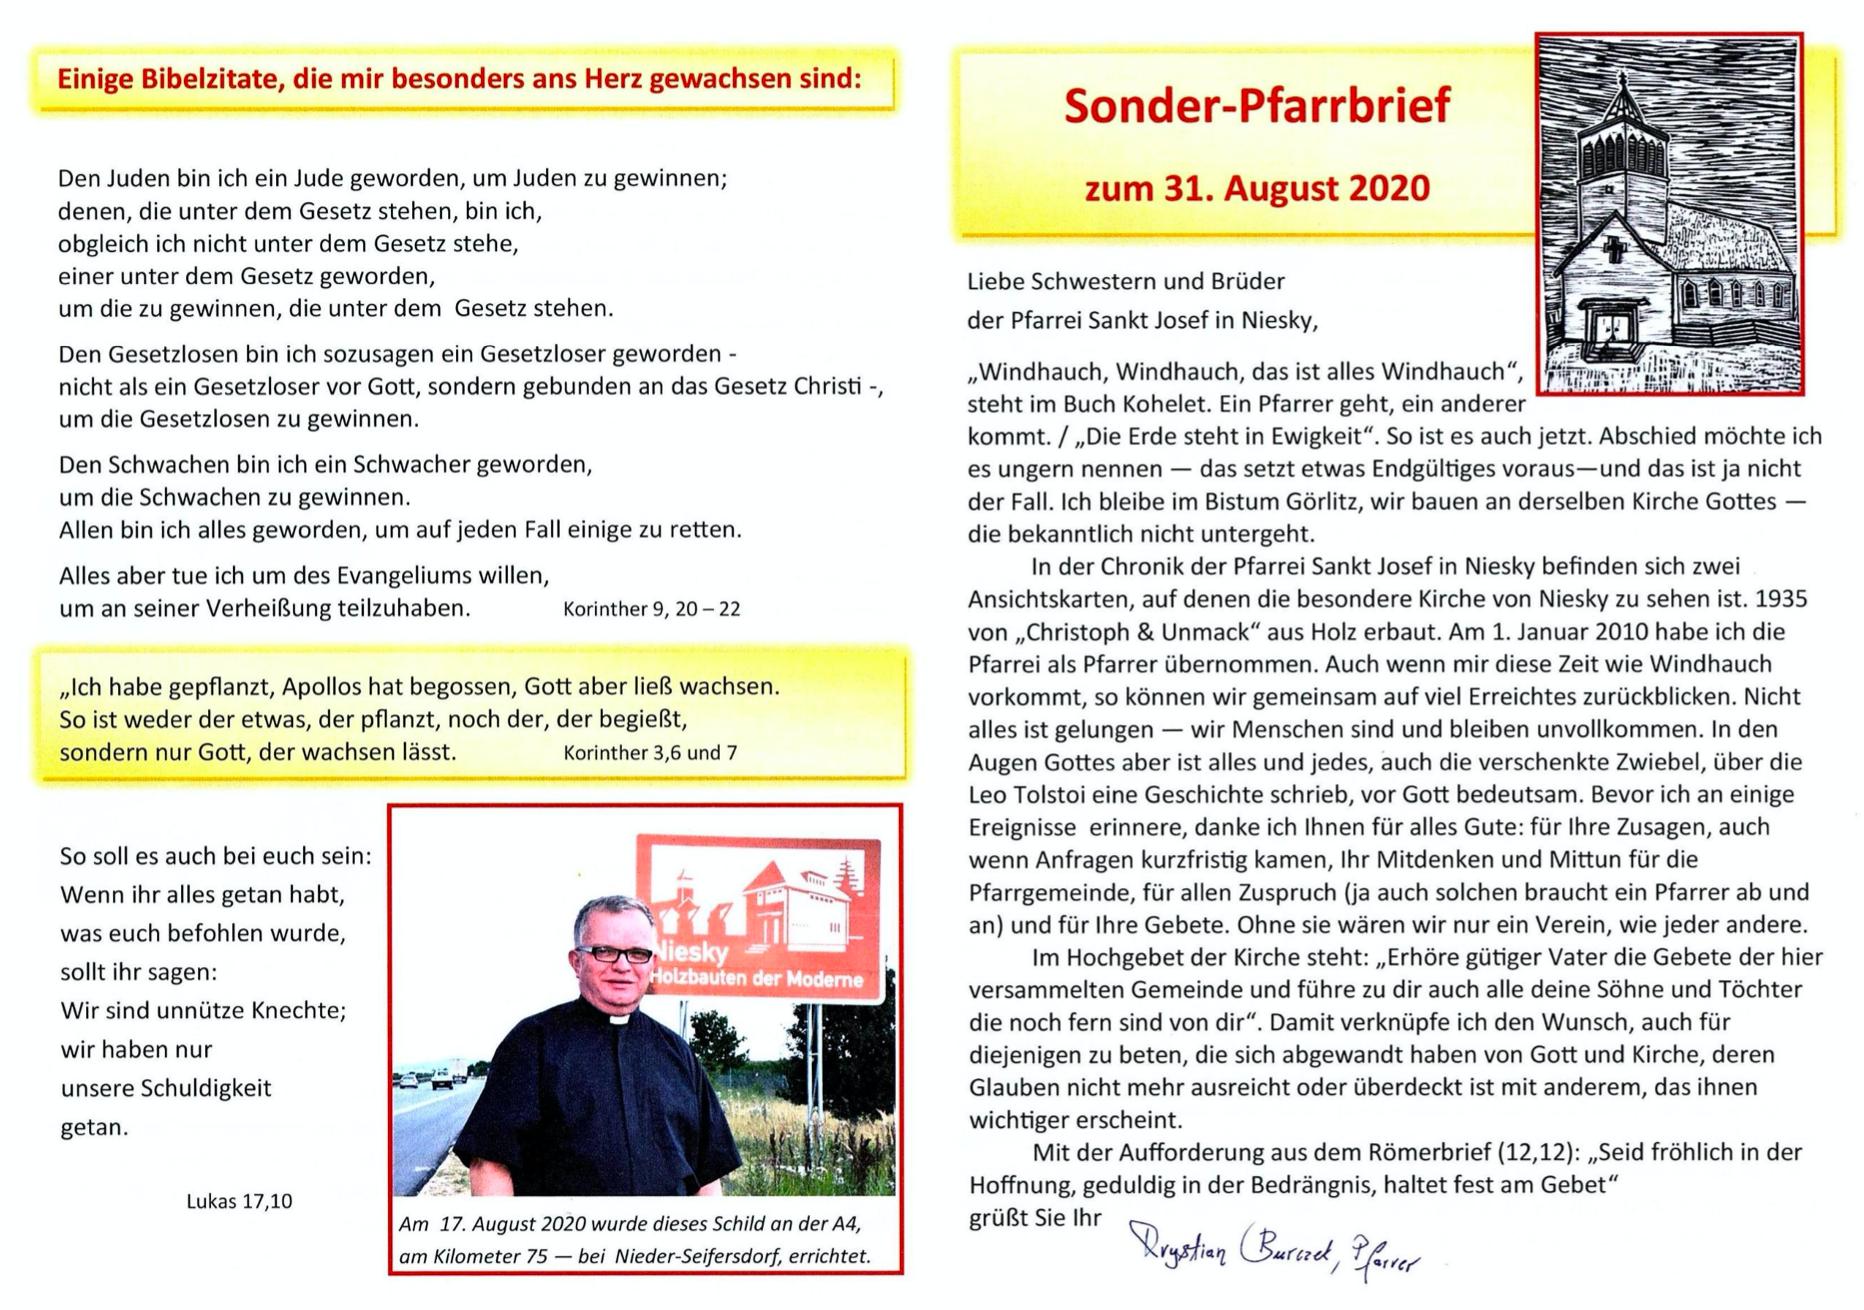 Sonderpfarrbrief Pfarrer Burczek